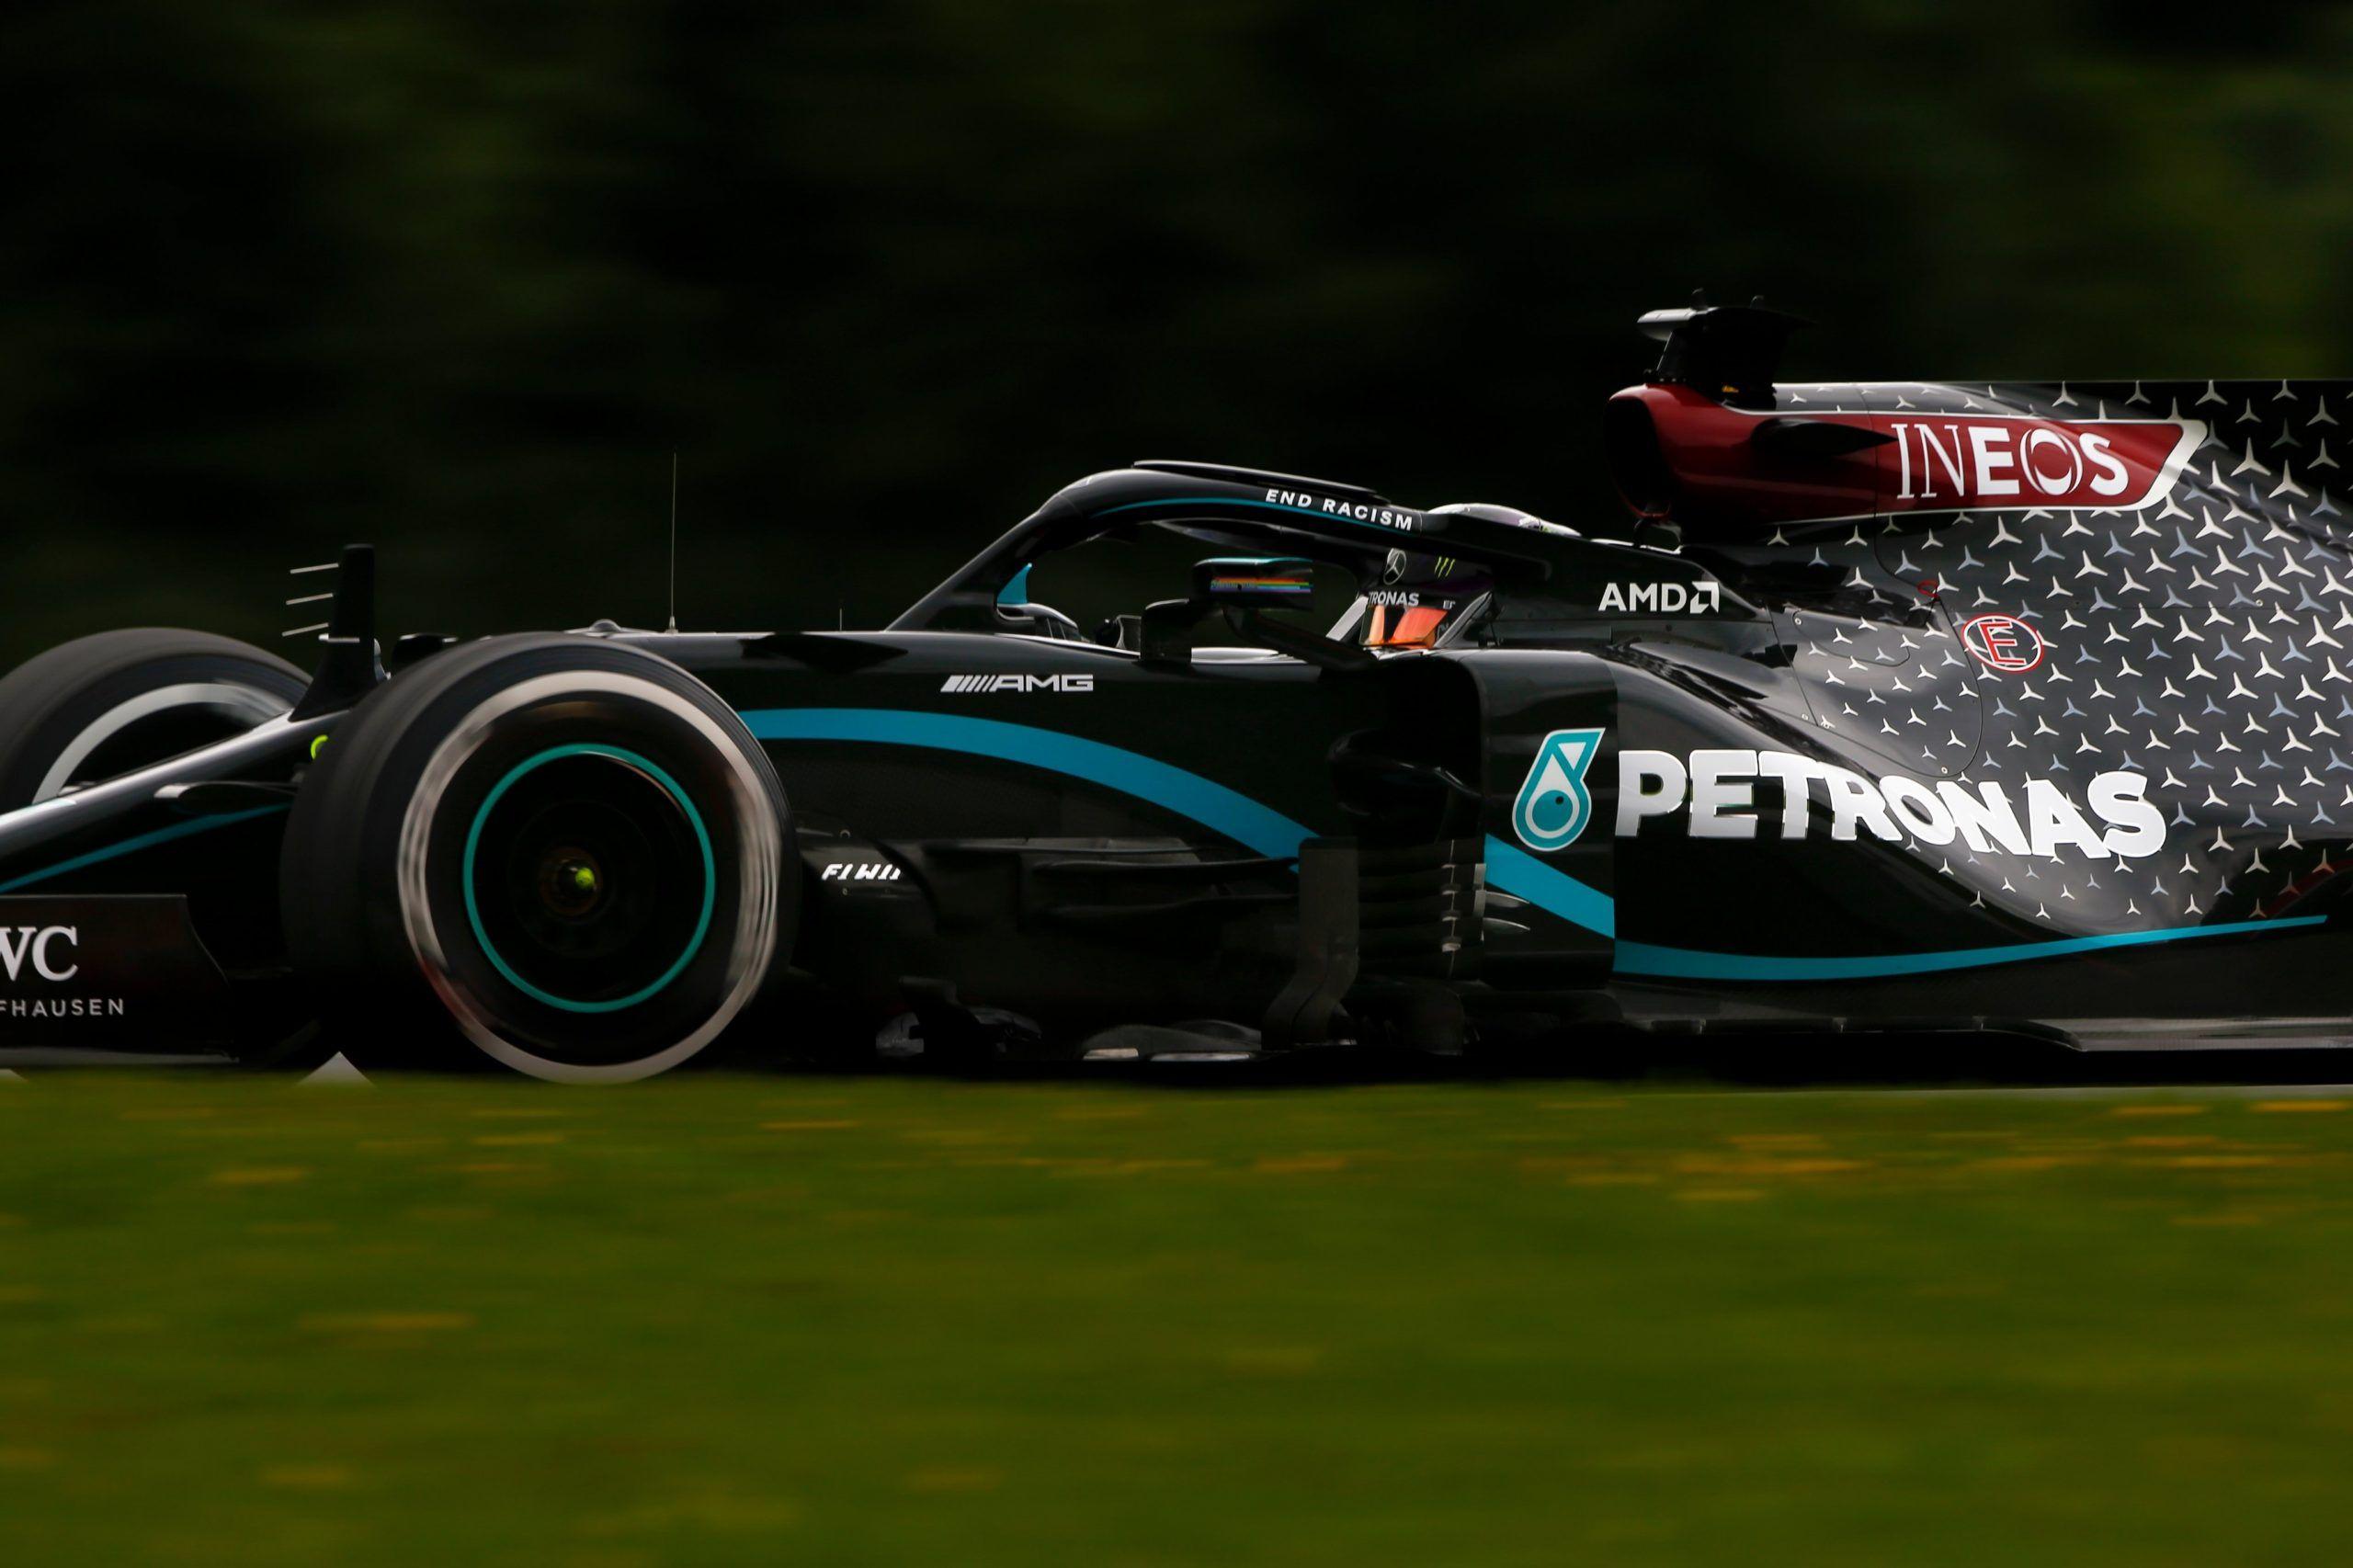 FIA, Mercedes, Red Bull